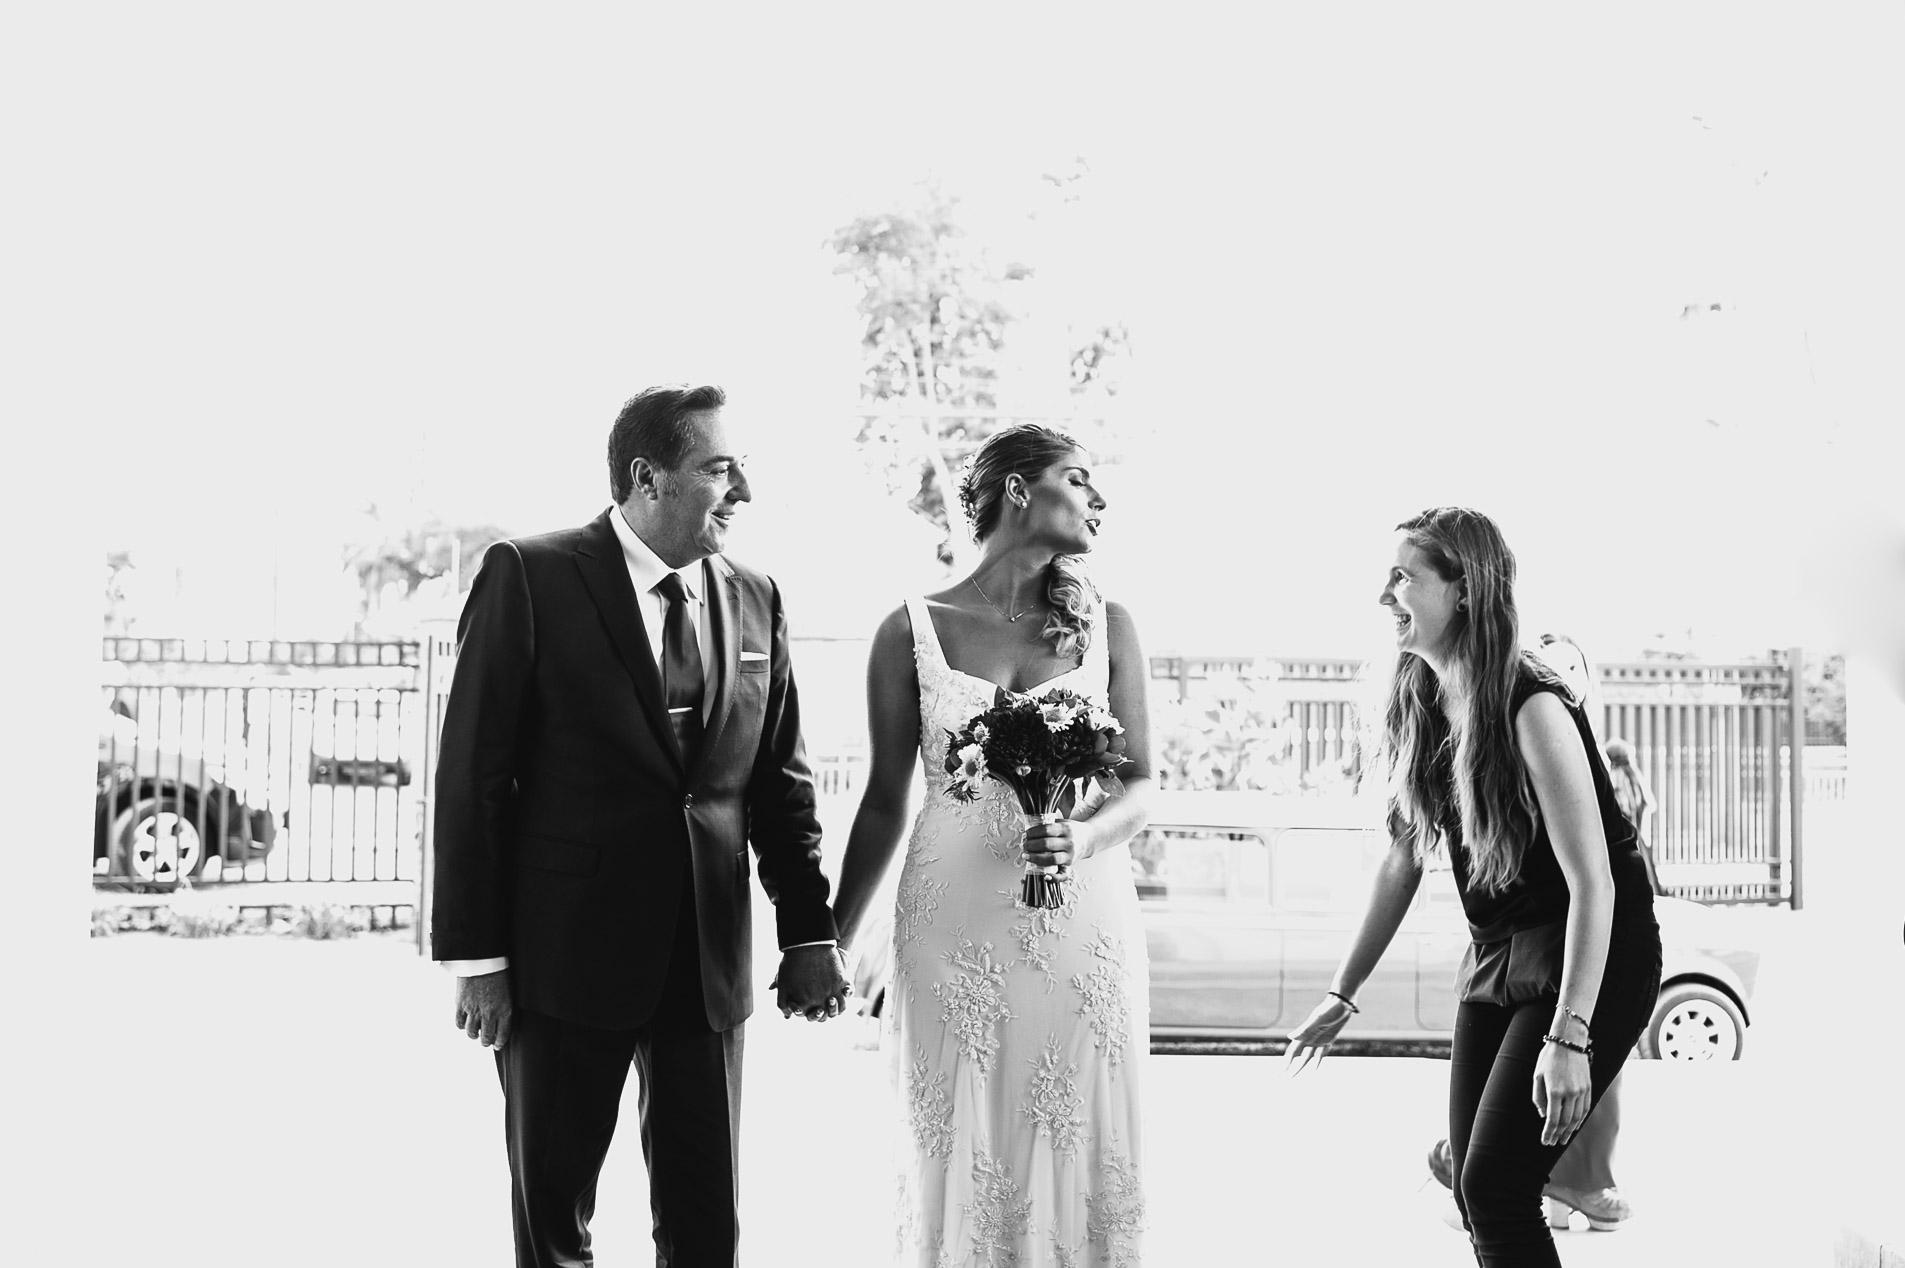 Mariana-Cristian-Fotos-Matrimonio-9